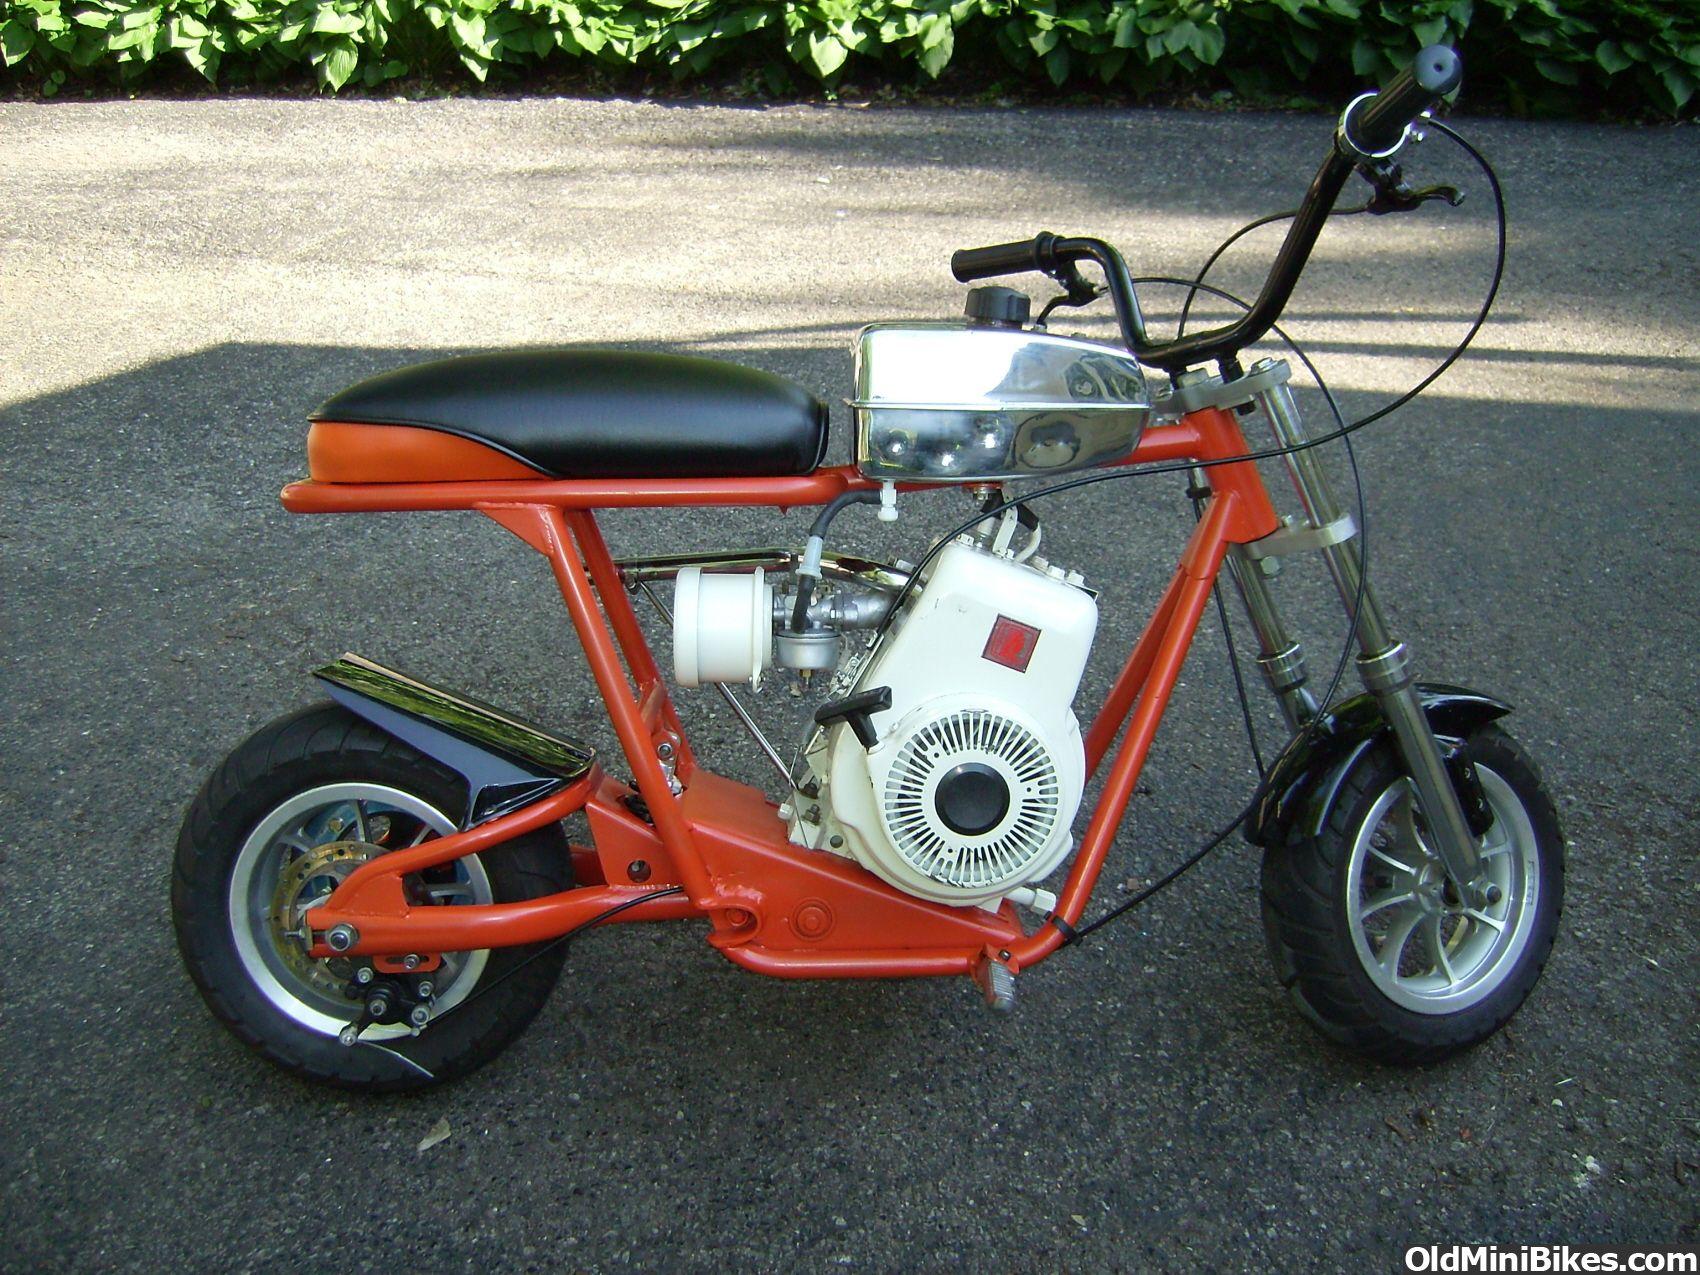 Coleman Ct200u Ex 196cc Extreme Mini Bike Performance Parts